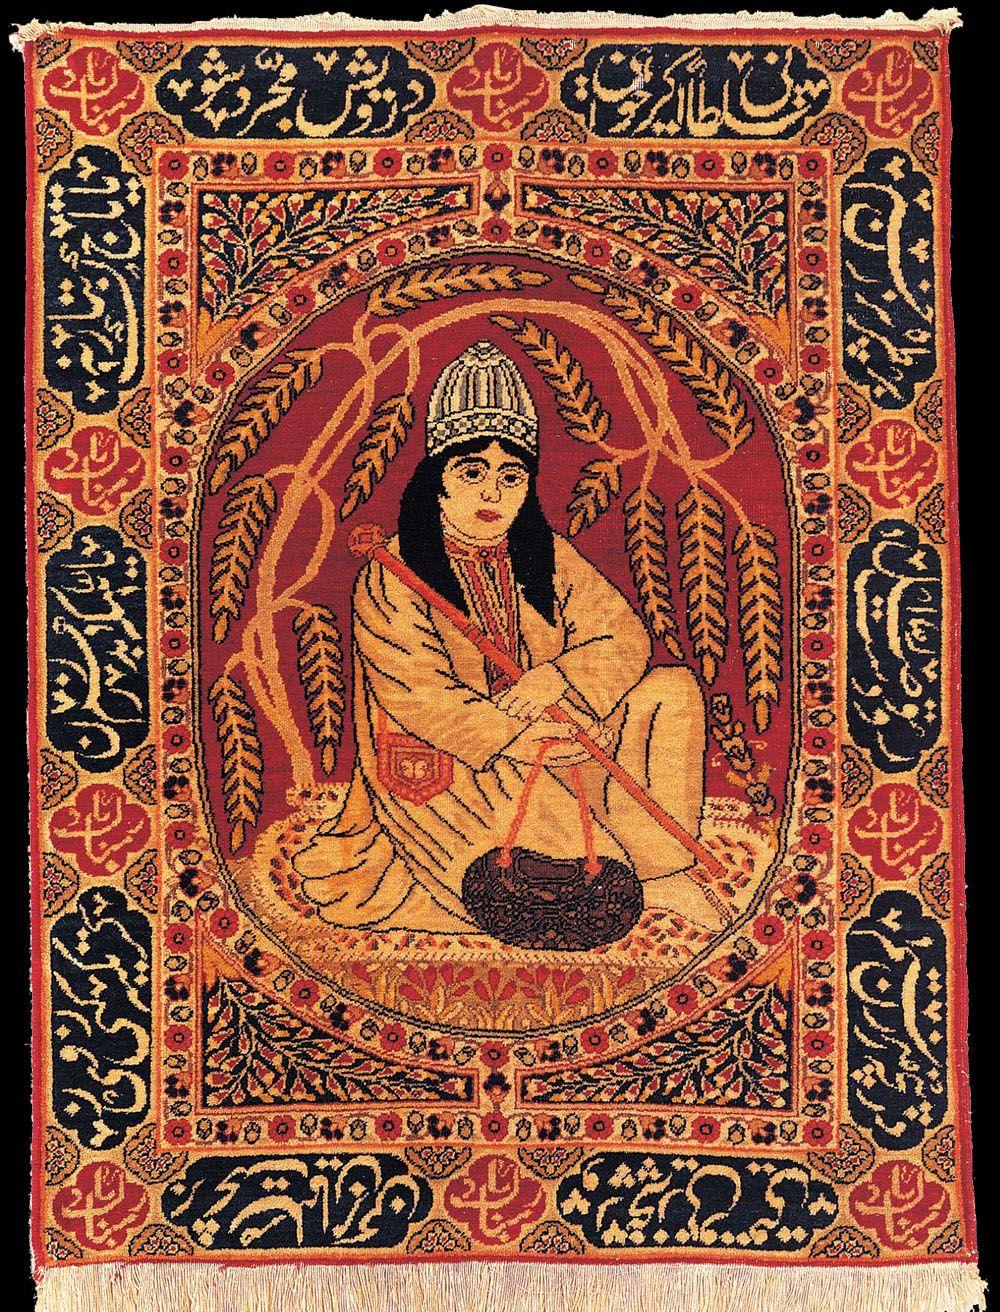 Antique Tabriz Pictorial Rug Quot Dervish Quot Azerbaijan Late